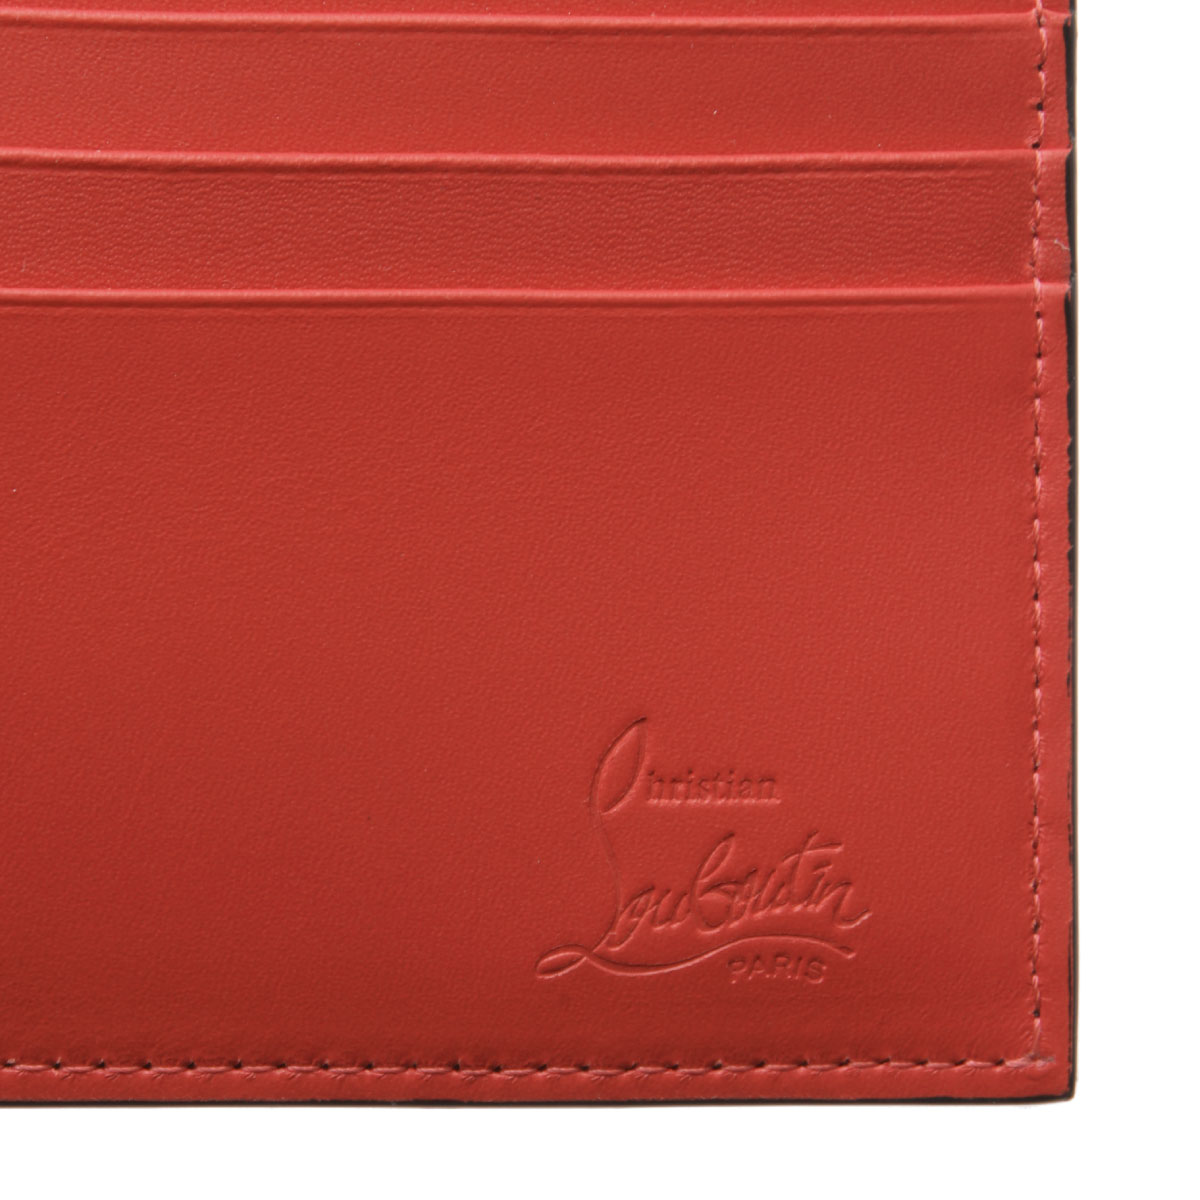 Christian Louboutin クリスチャン ルブタン | 二つ折り財布 | COOLCARD クールカード